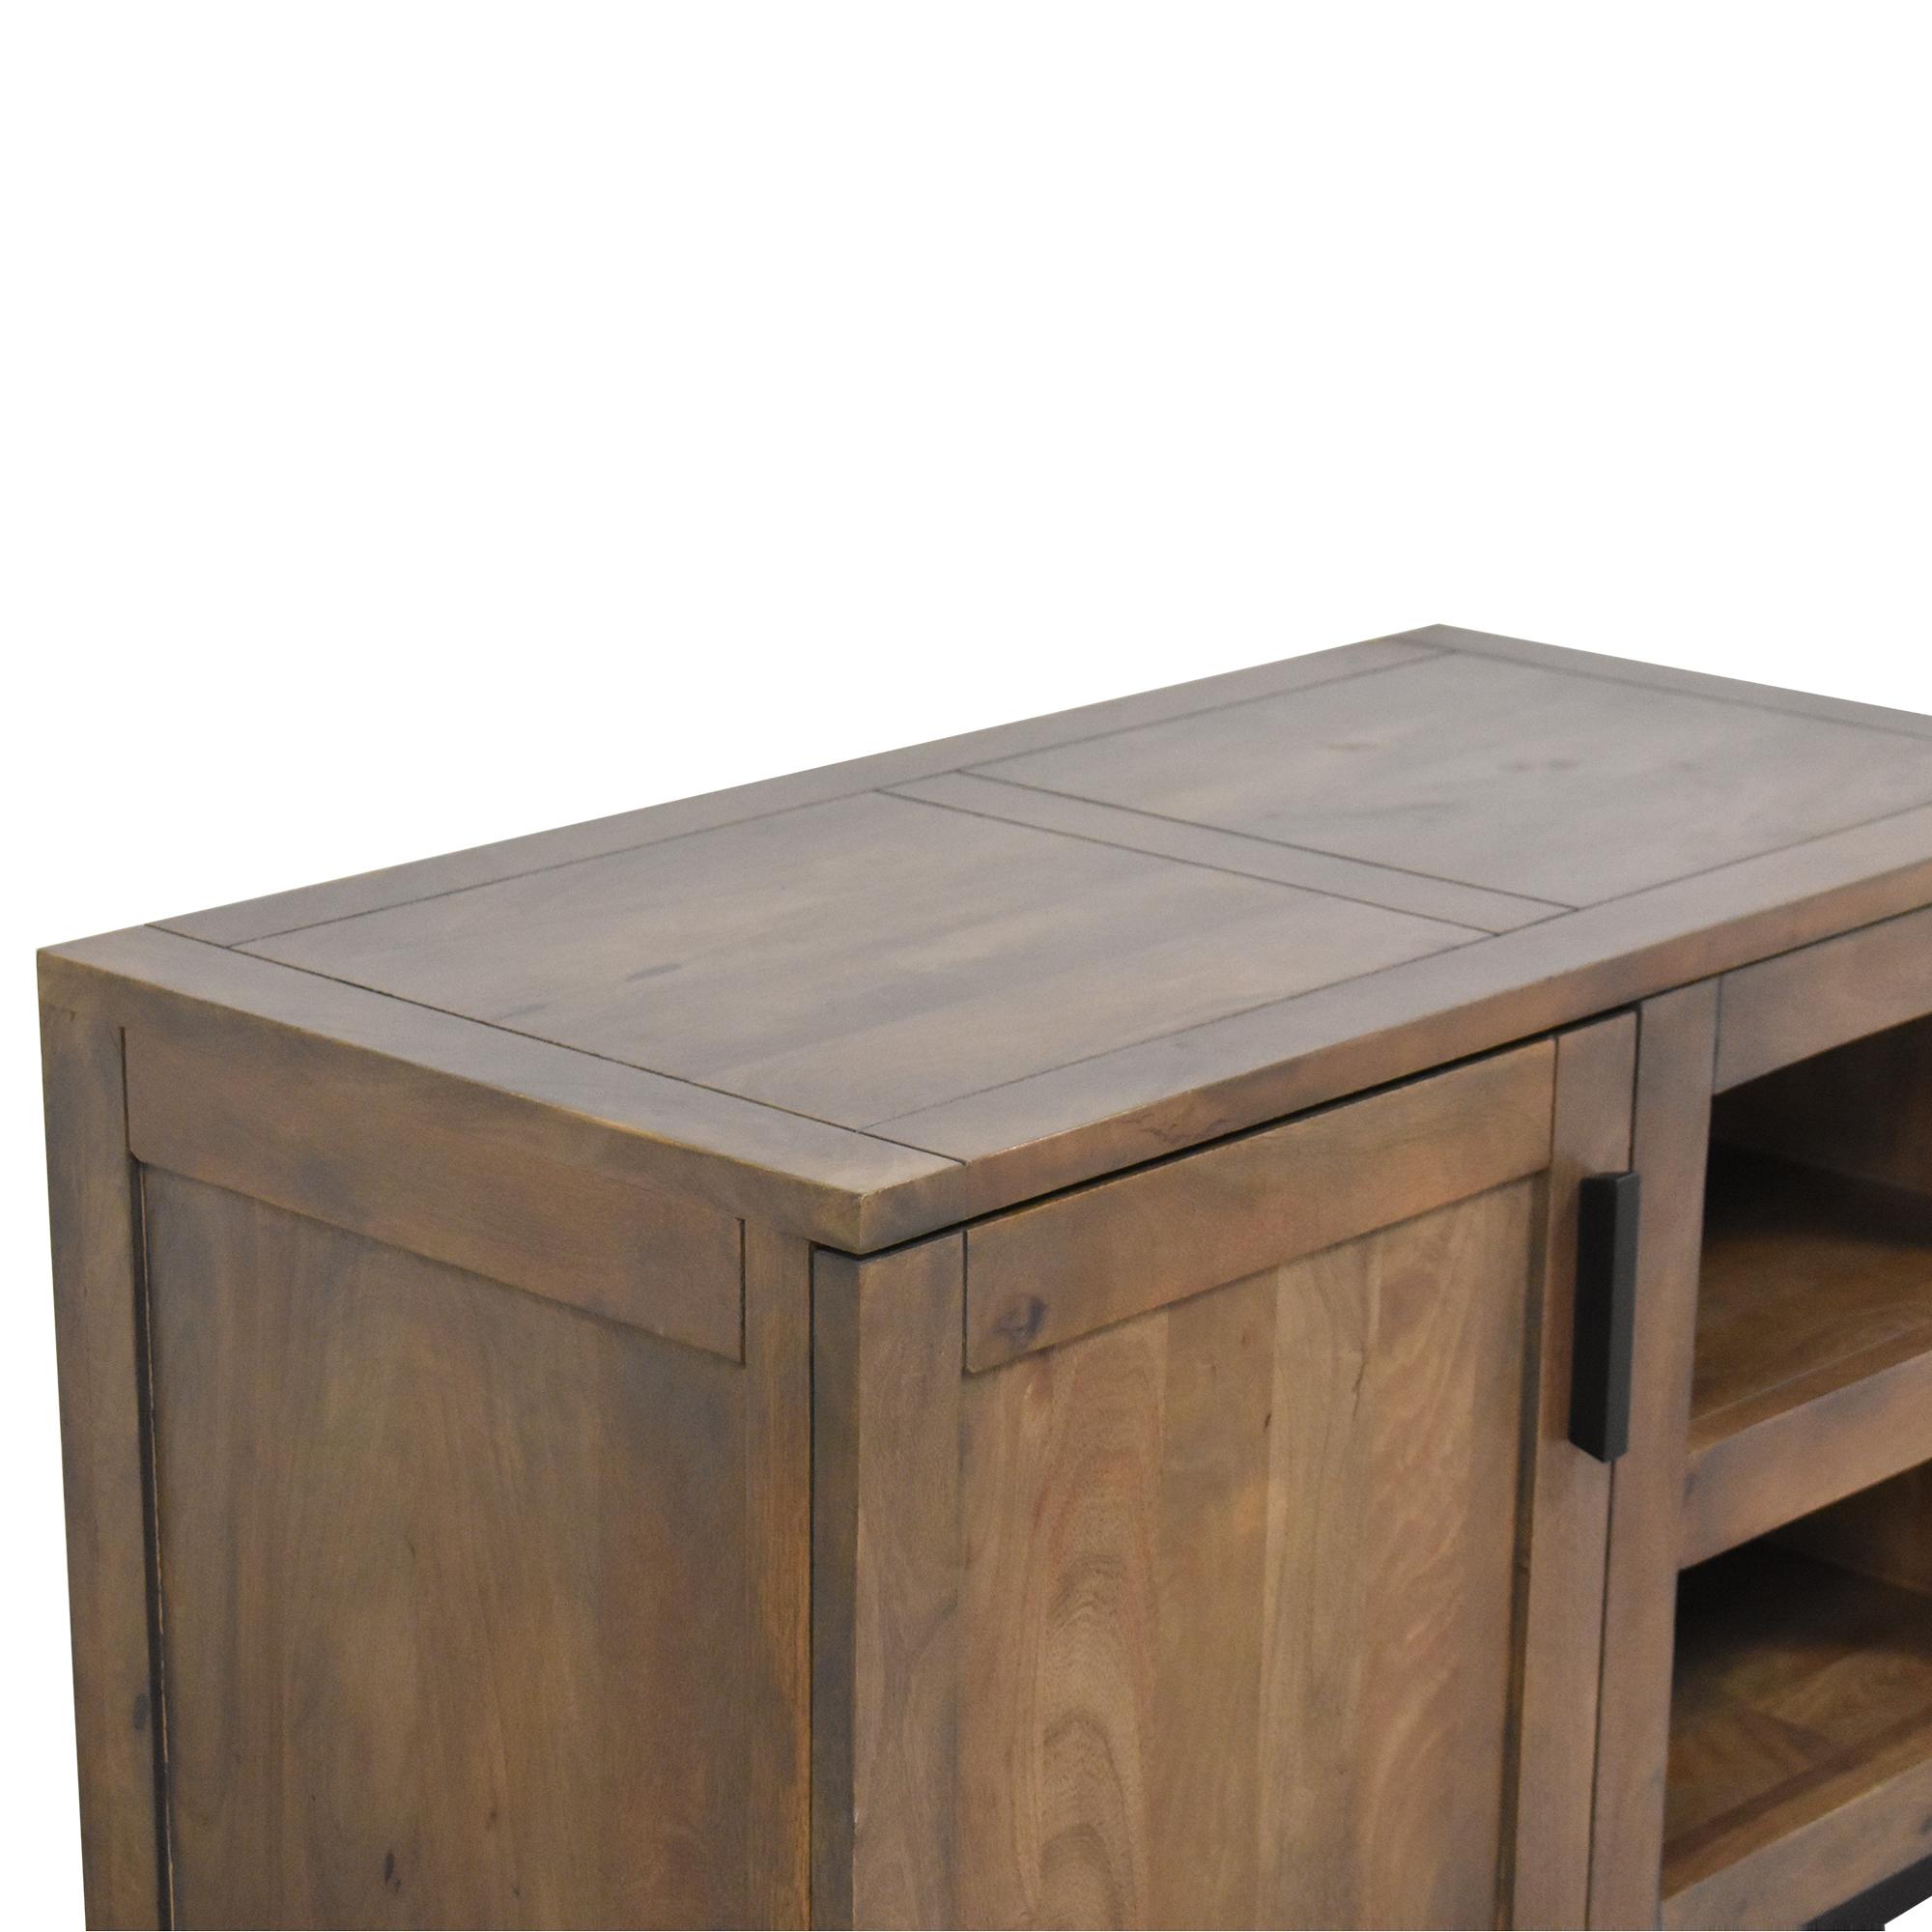 buy Crate & Barrel Crate & Barrel Wyatt Media Console online